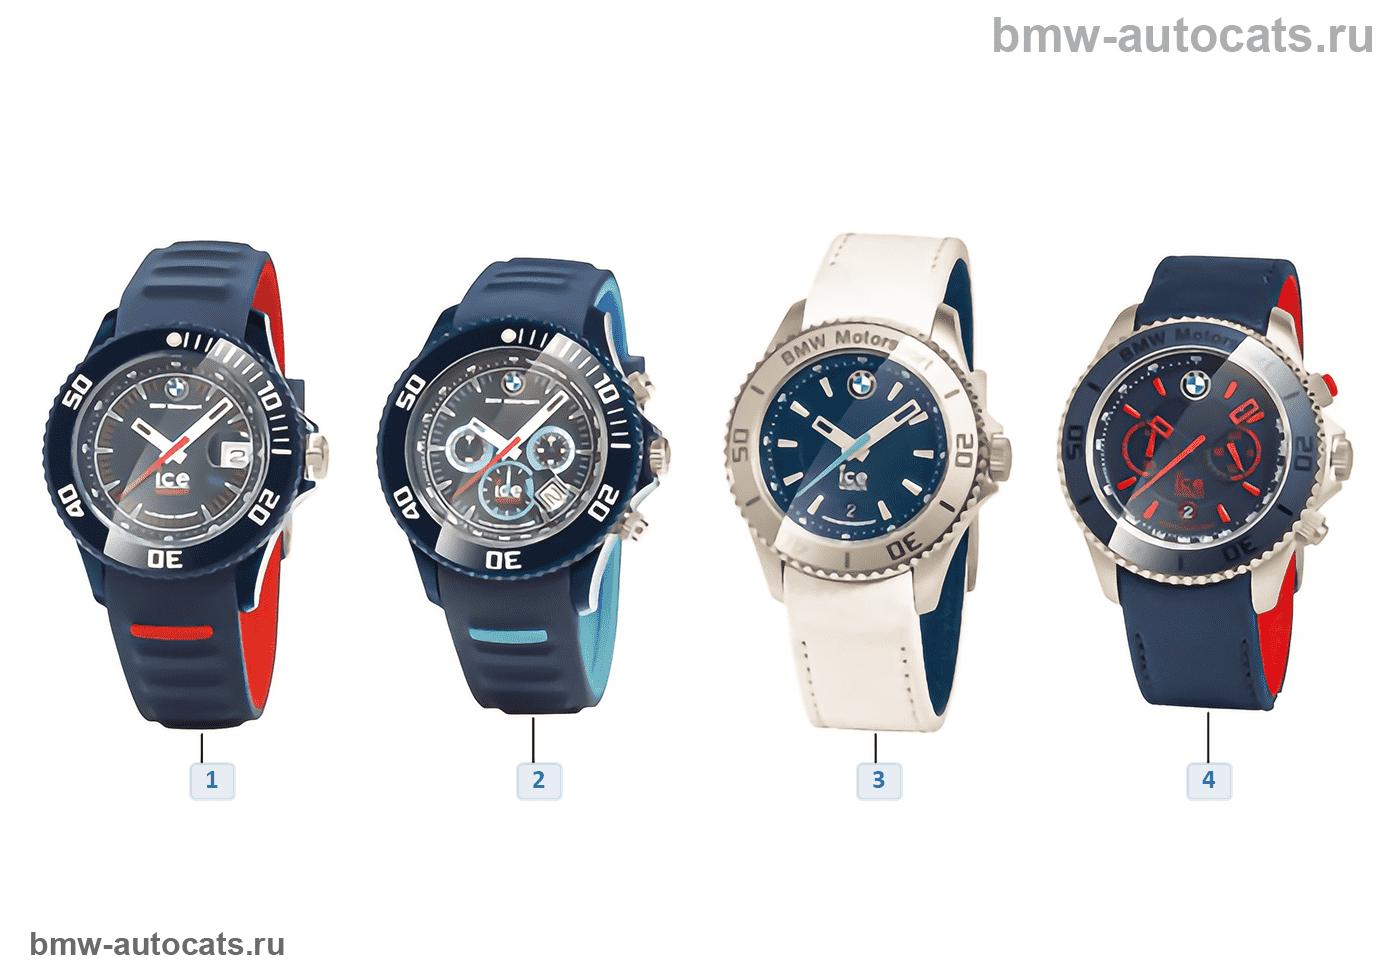 BMW Motorsport — Часы 2015/17